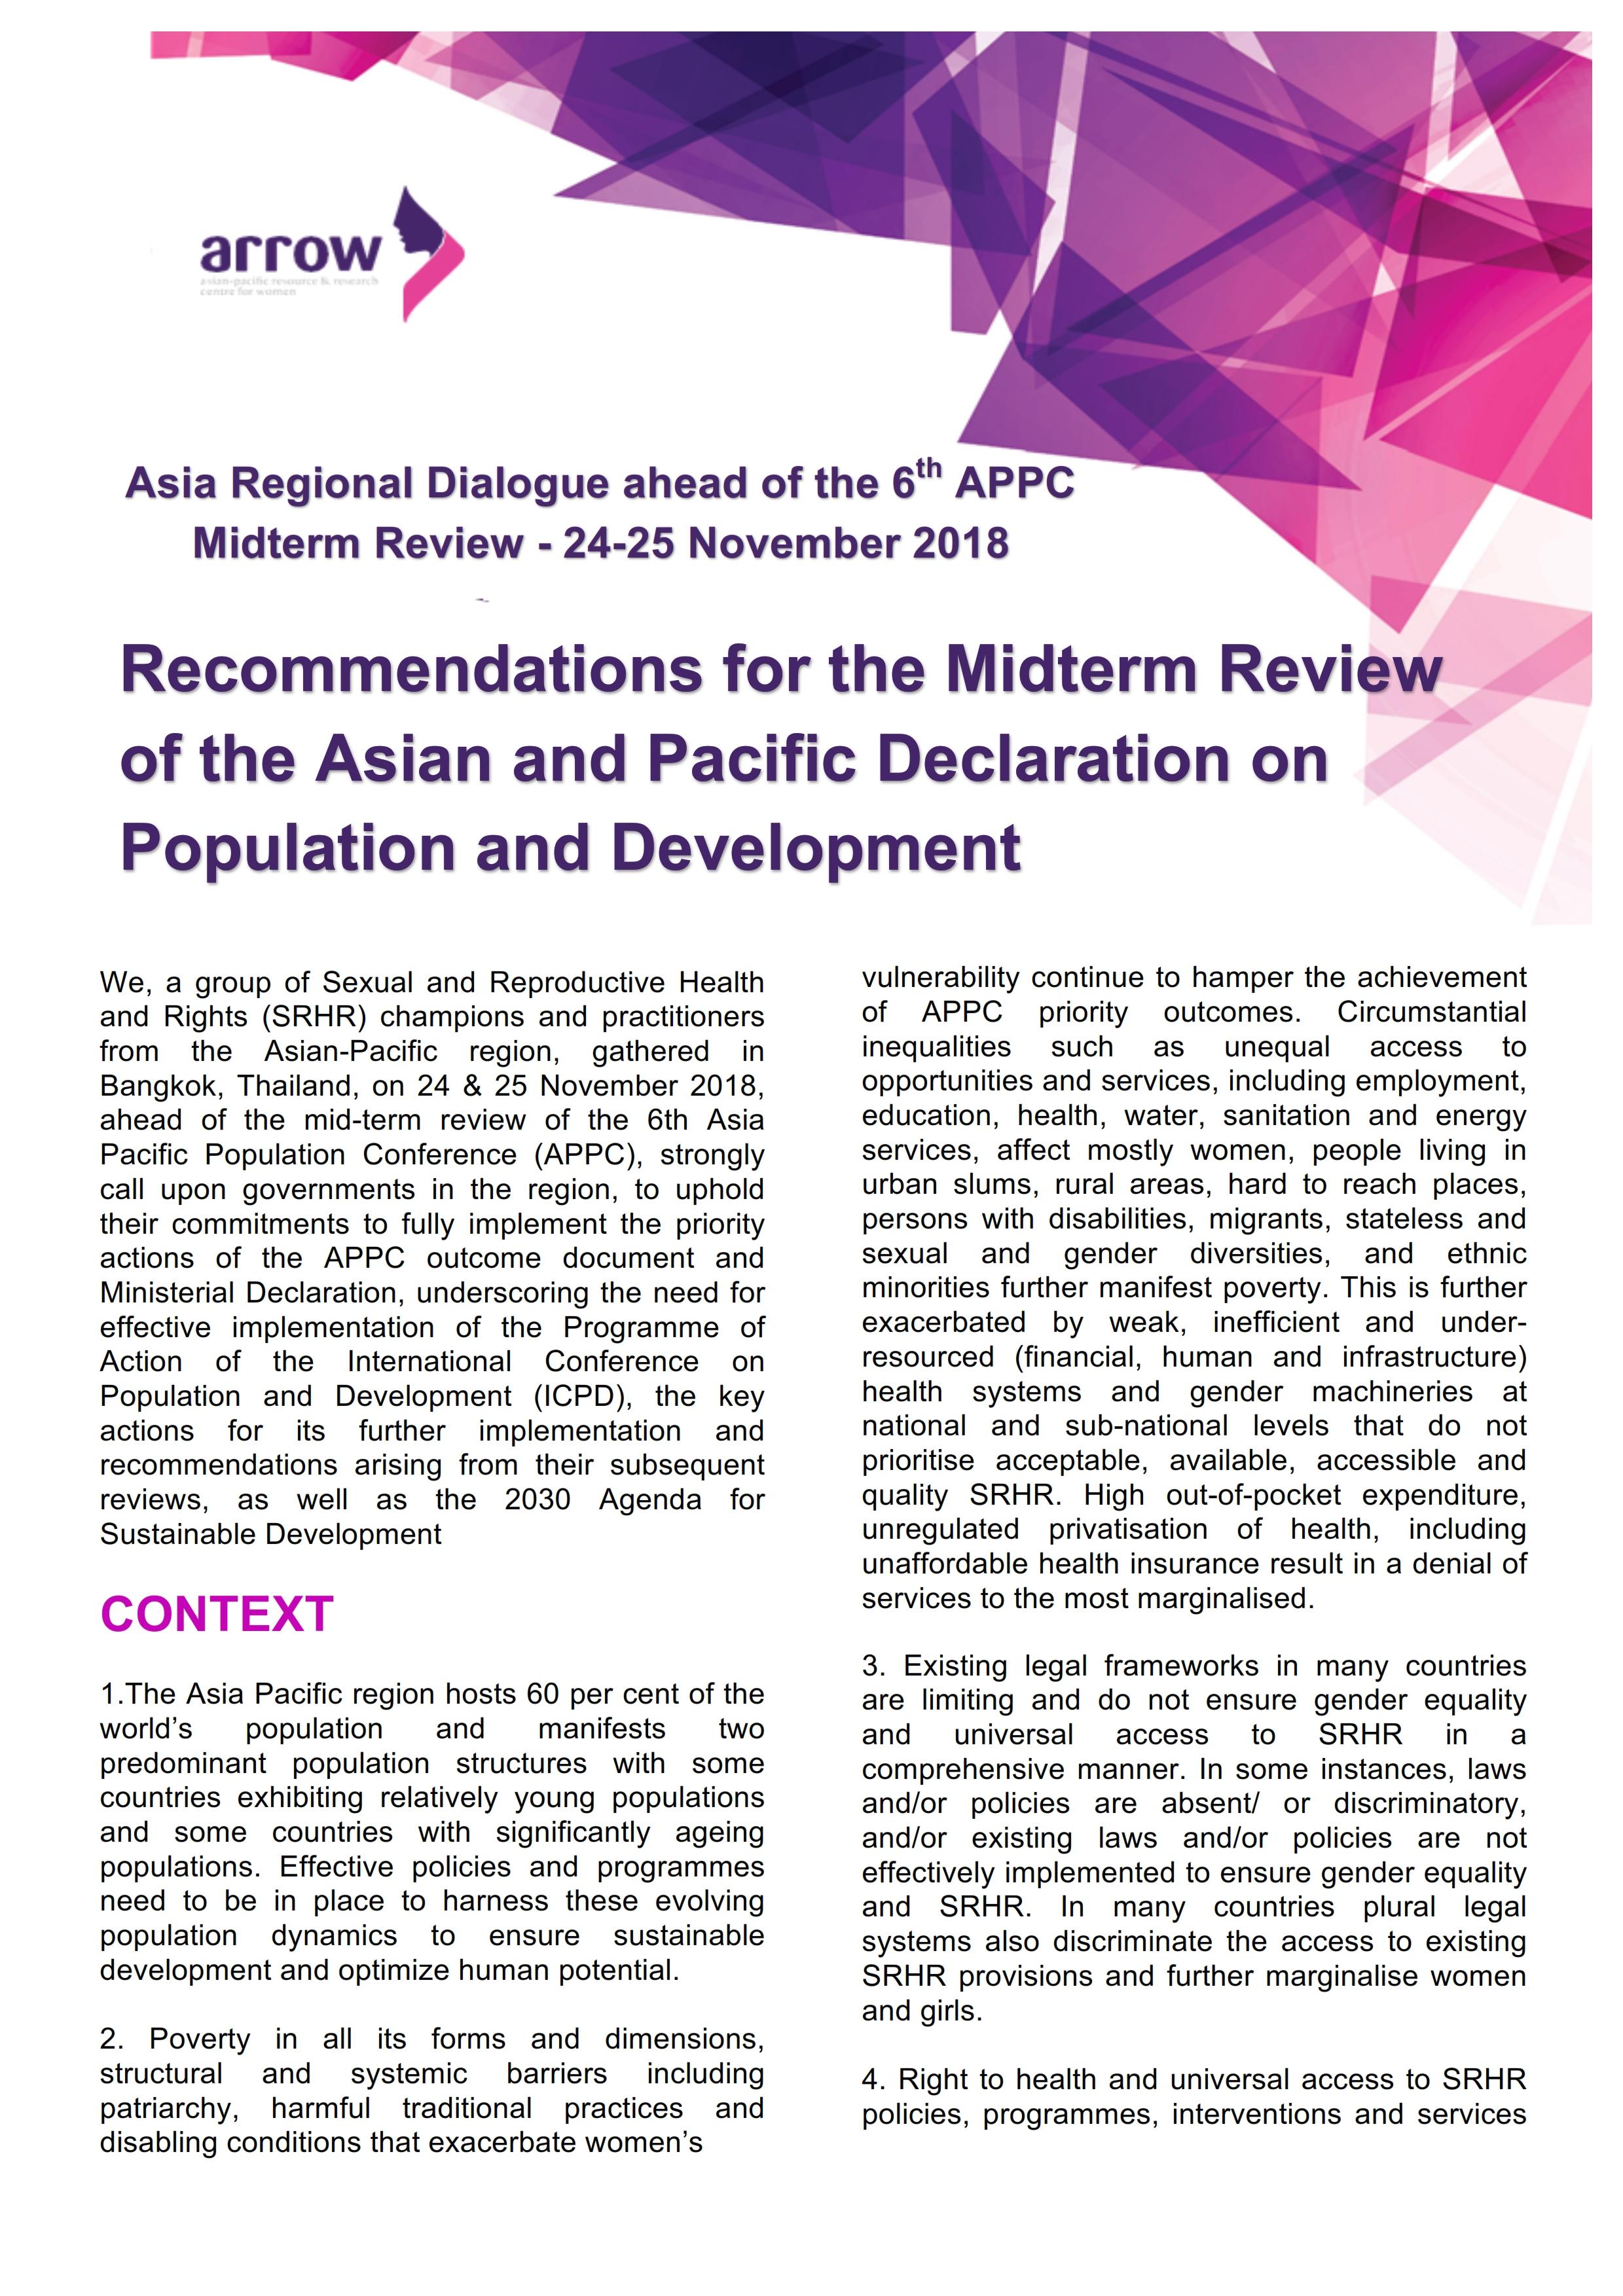 Asia Regional Dialogue_MTR APPC Recommendations_Nov 2018_001